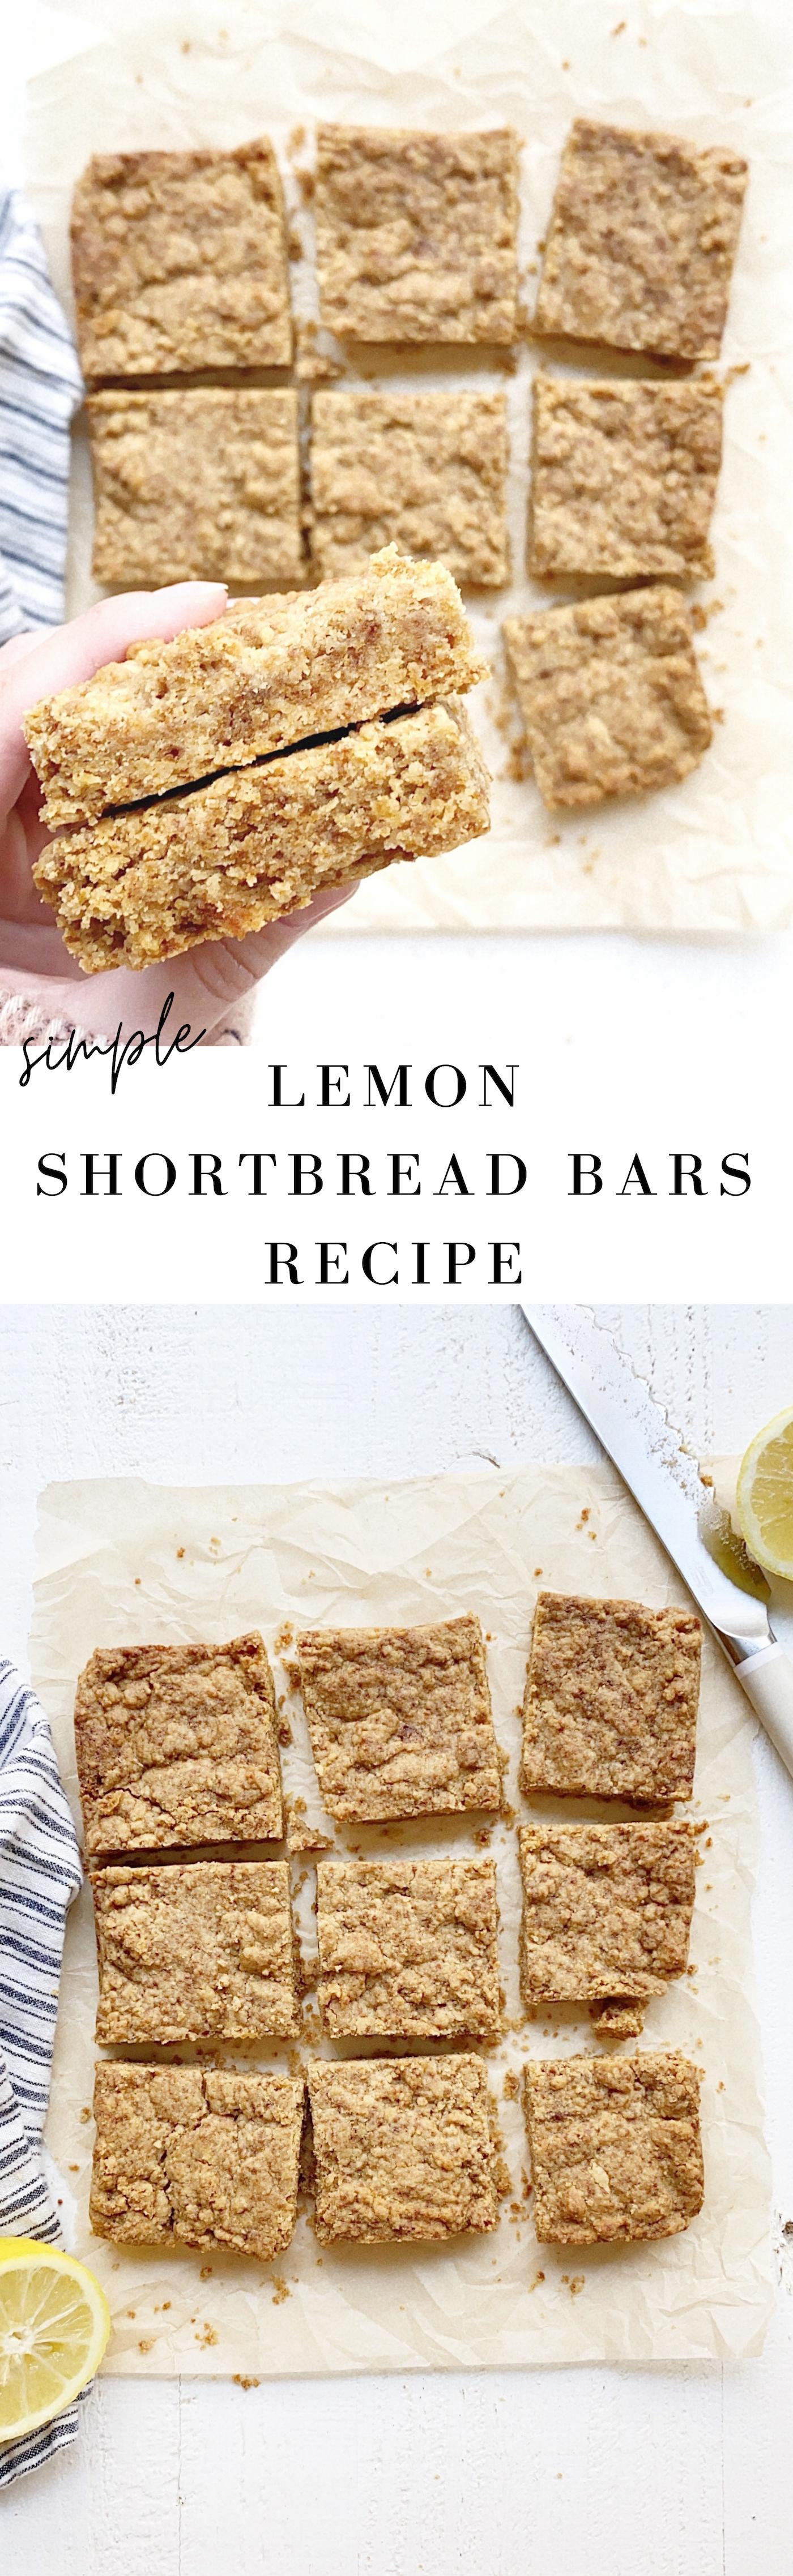 Lemon Shortbread Bars Recipe